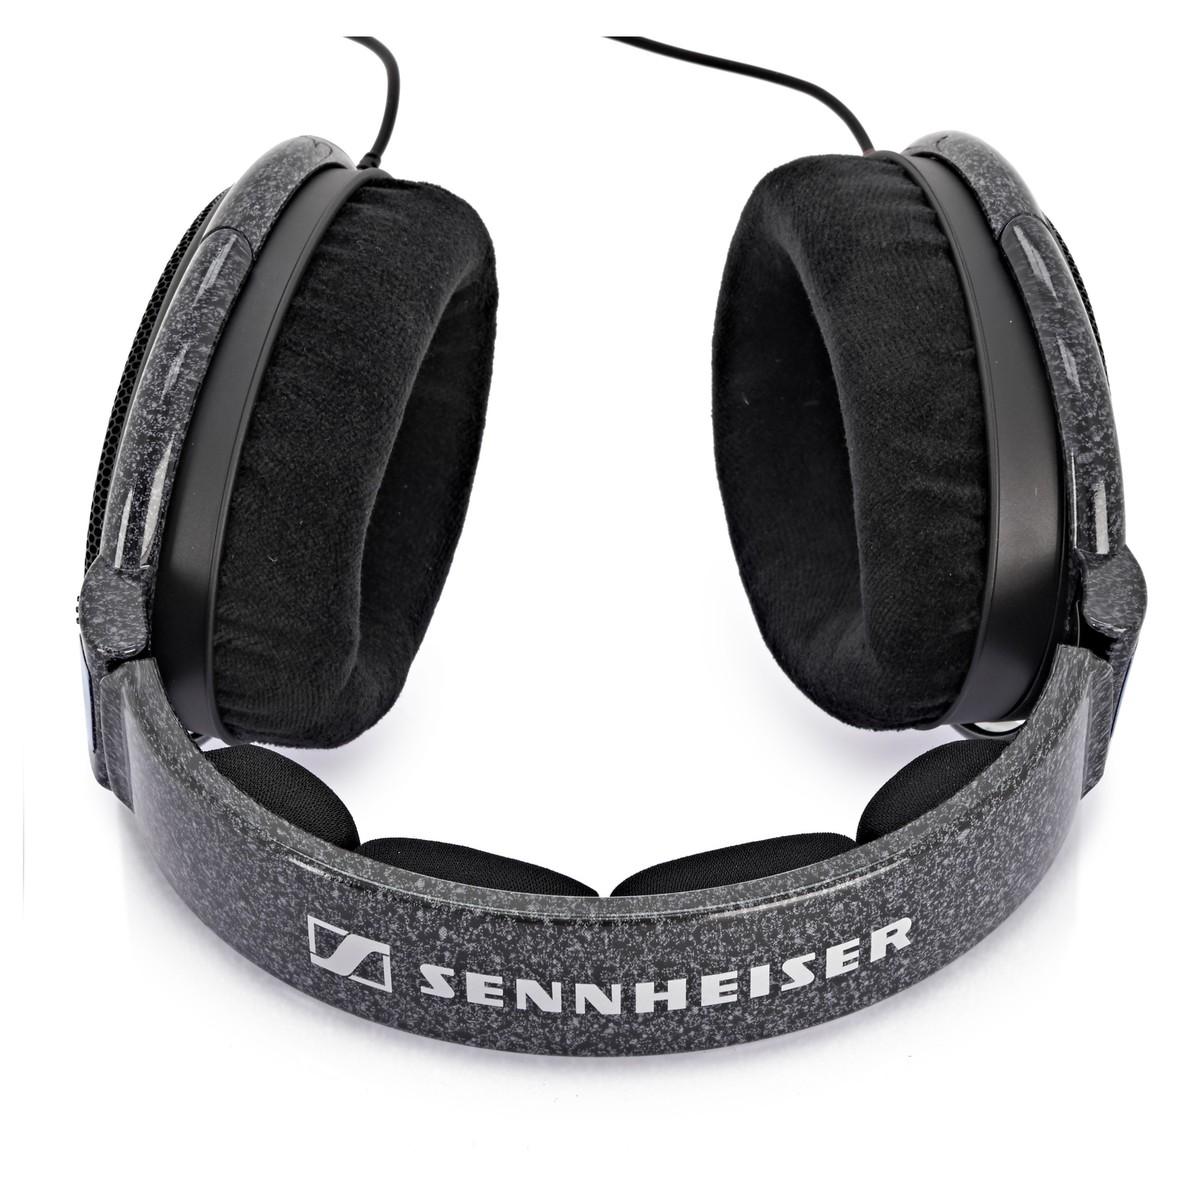 sennheiser hd 600 avantgarde headphones box opened at gear4music. Black Bedroom Furniture Sets. Home Design Ideas